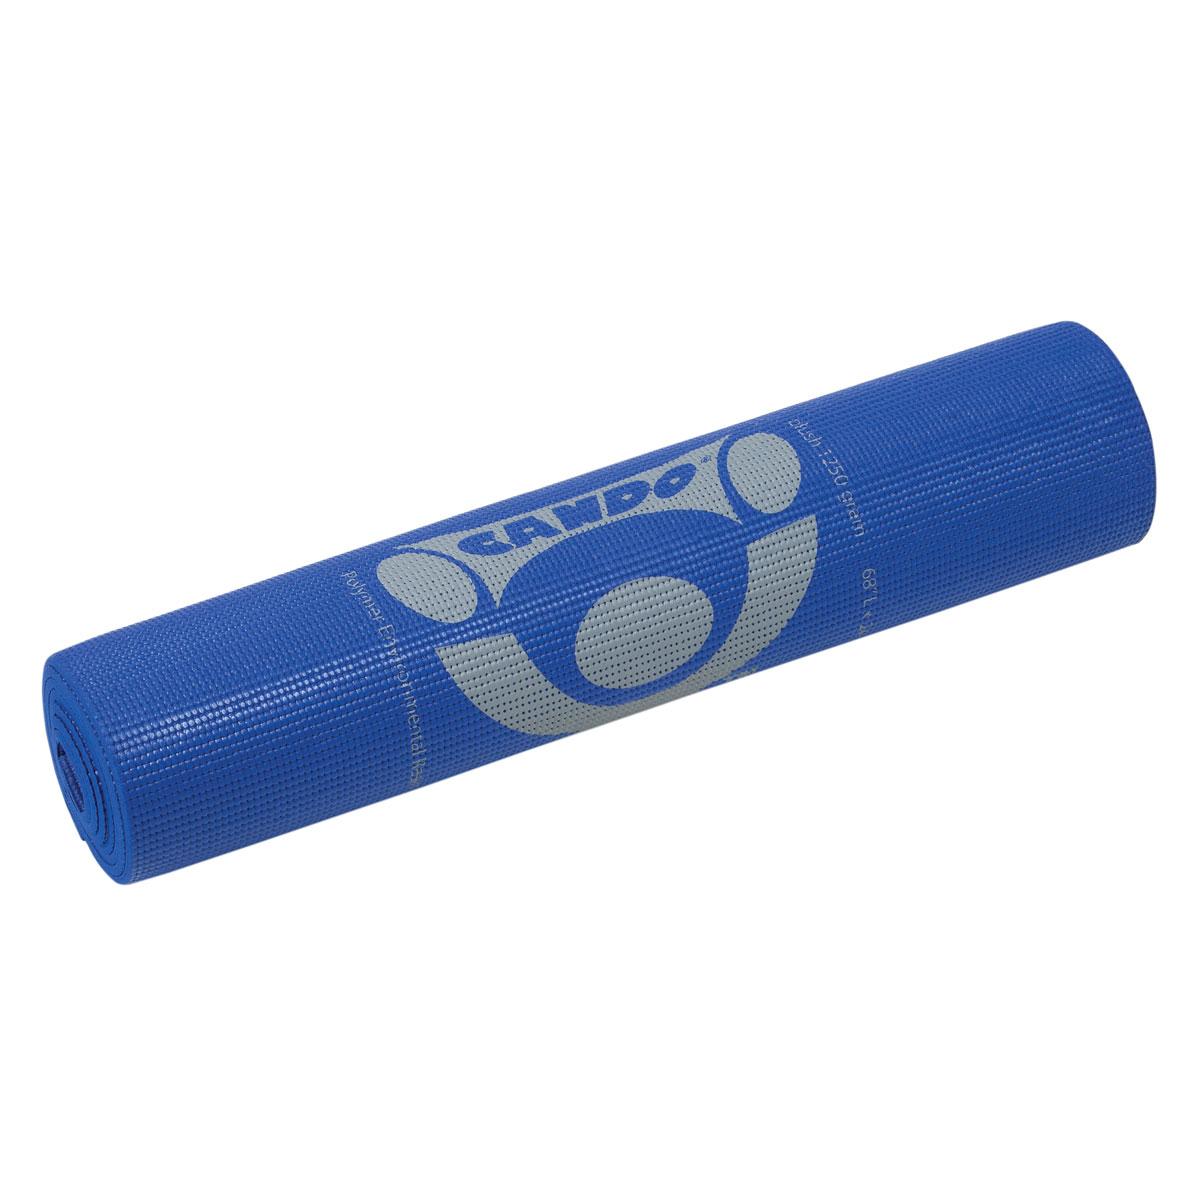 Cando 174 Per Yoga Mat Yoga Mats Exercise Mats